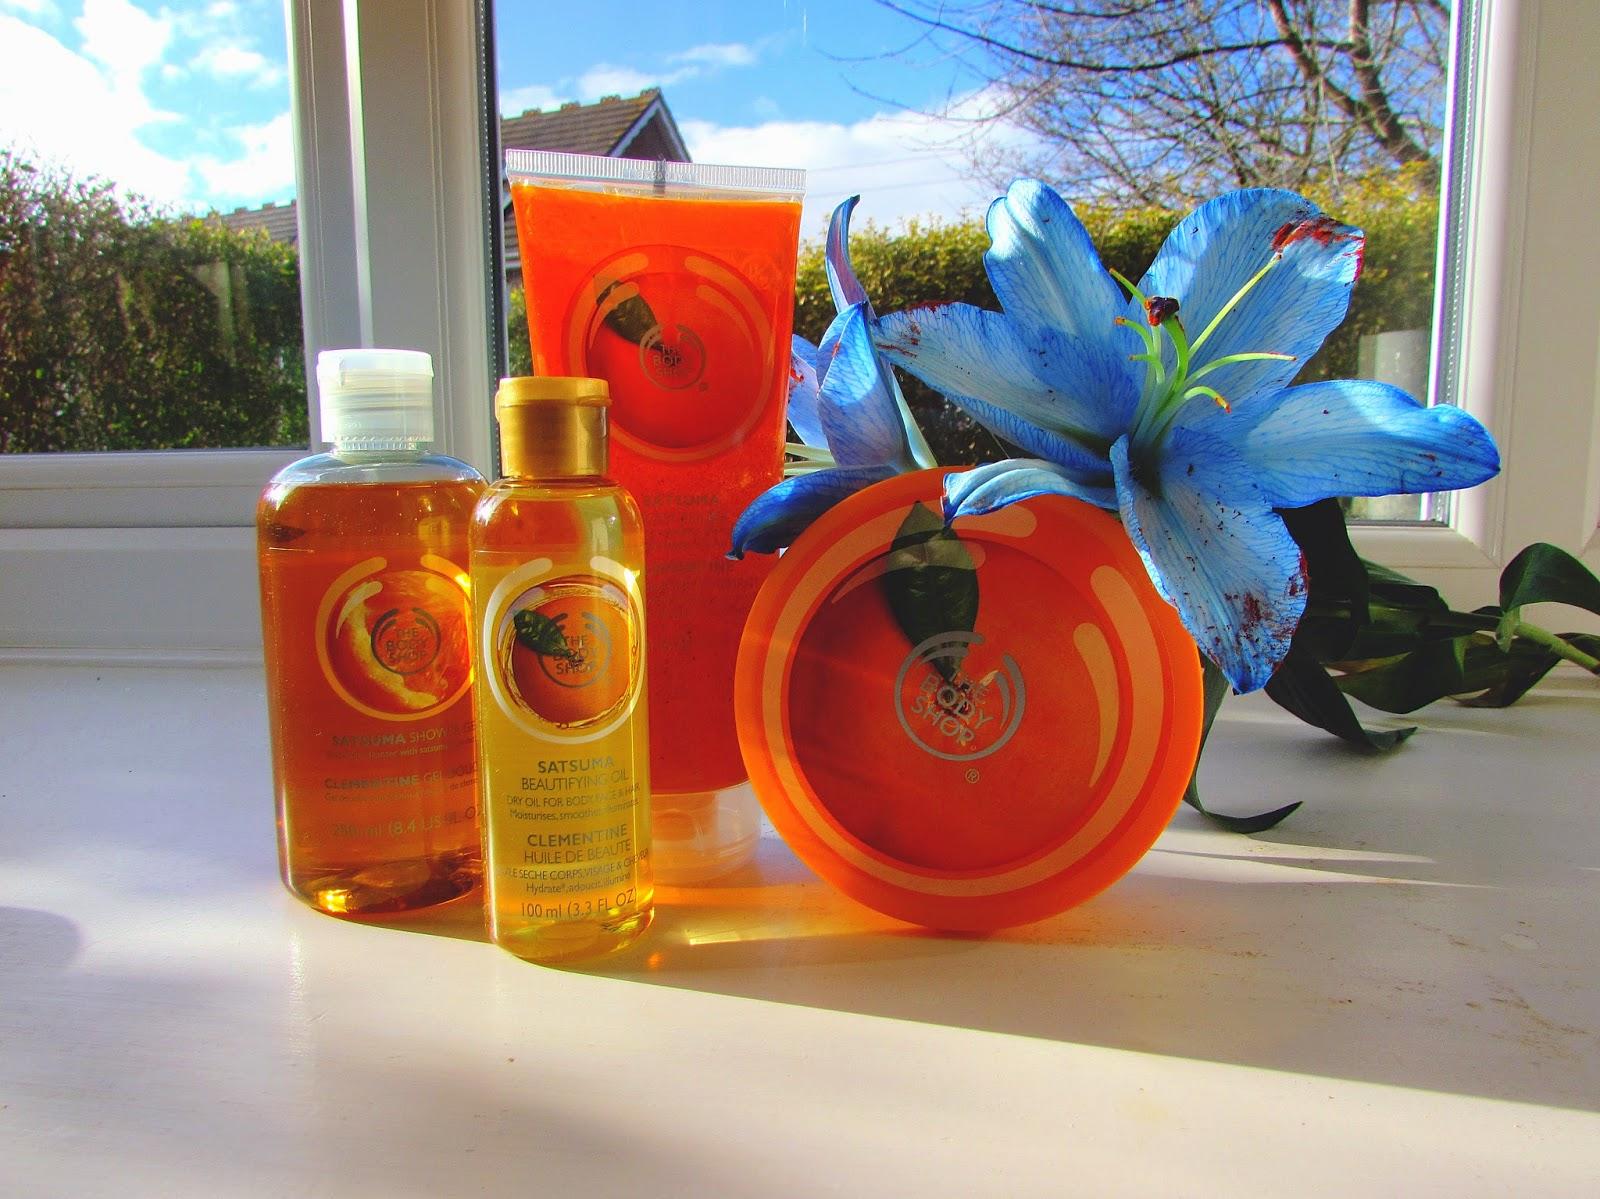 The Body Shop | Satsuma shower gel | Satsuma body and hair oil | Satsuma body butter | Satsuma body polish